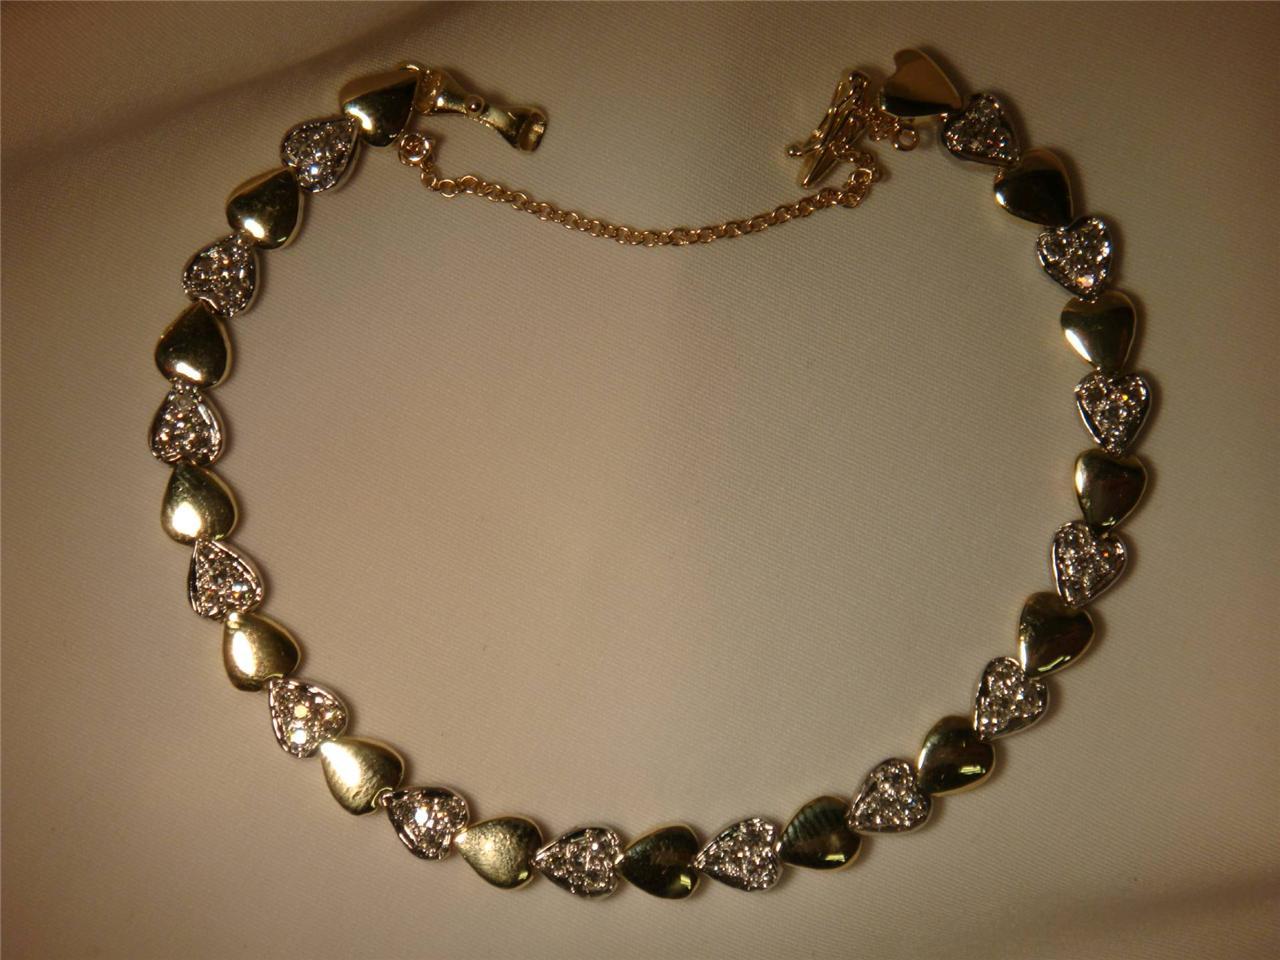 Beautiful 14k Gold and Diamonds Two Tone Heart Bracelet | eBay